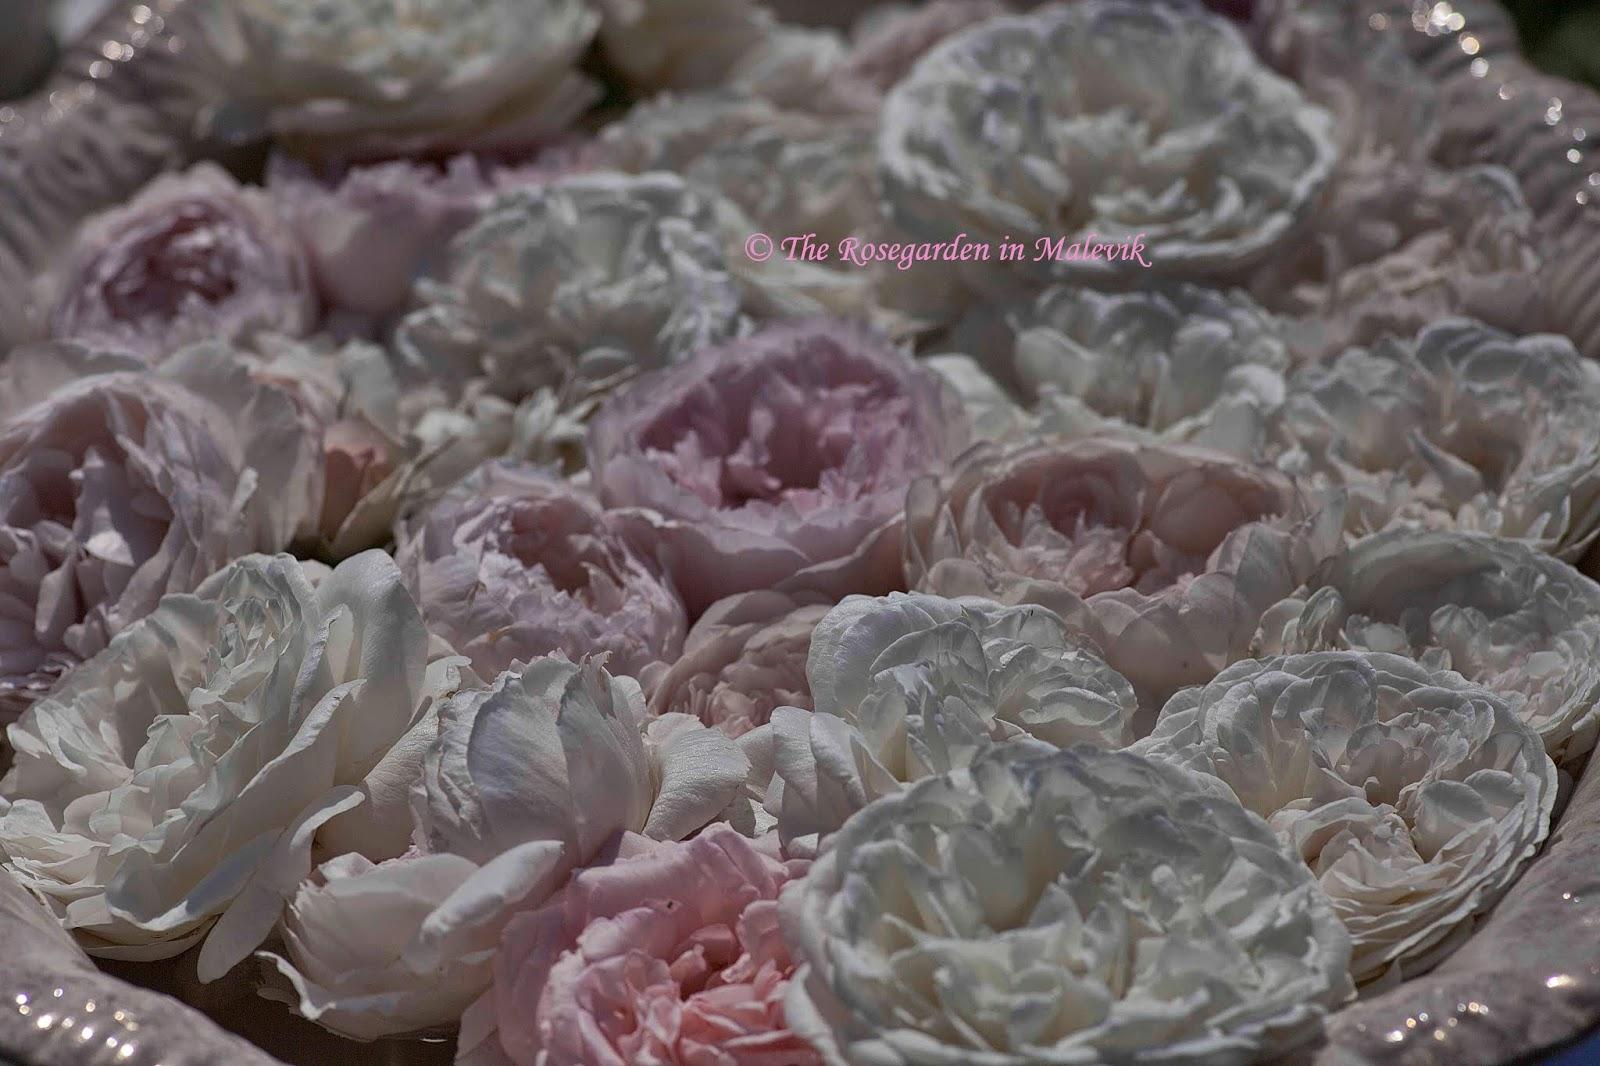 Rose garden malevik: juli 2014